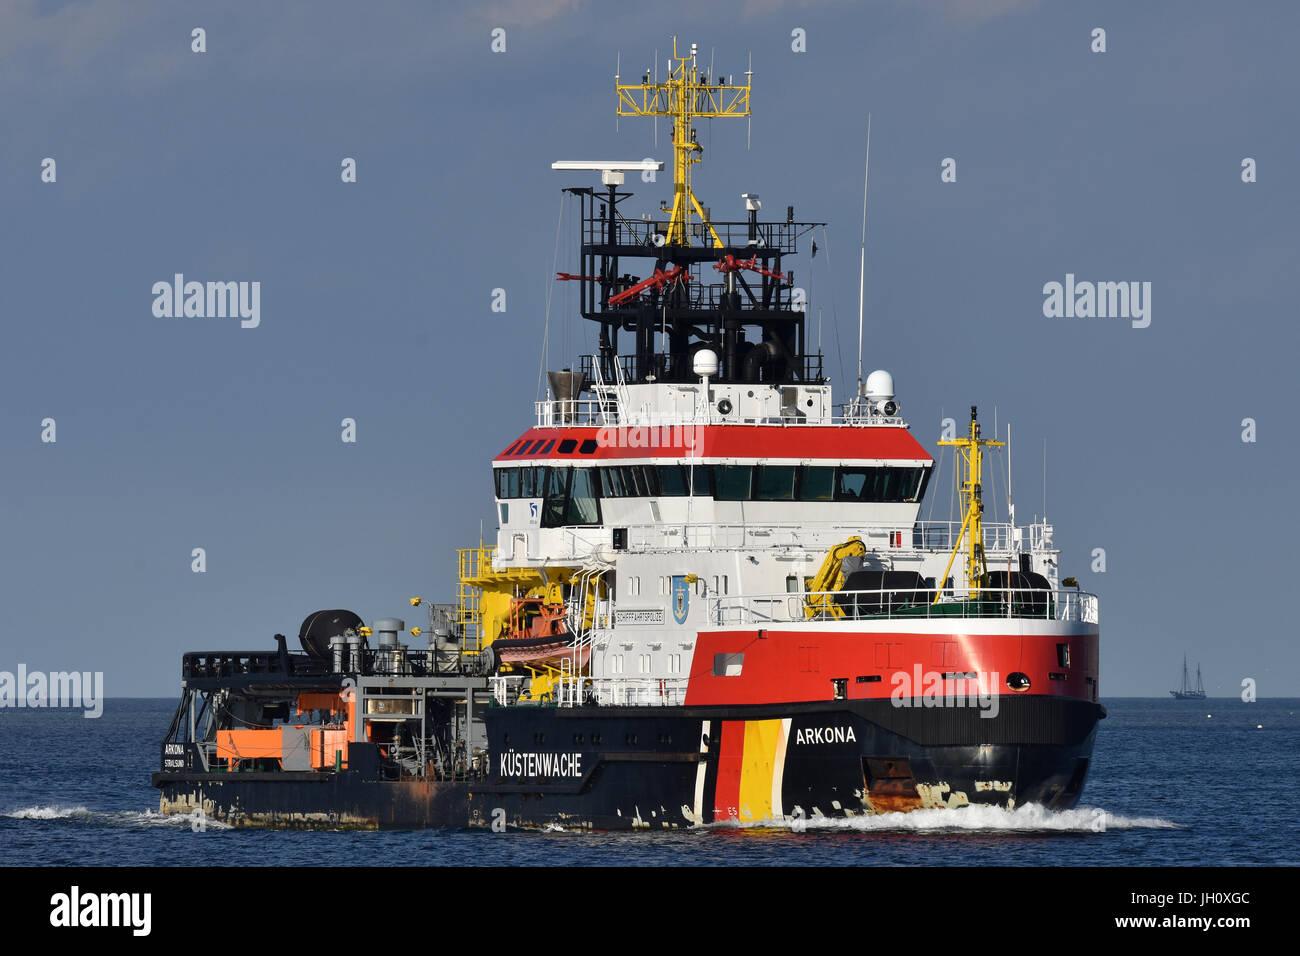 Pollution Control Vessel Arkona Stock Photo